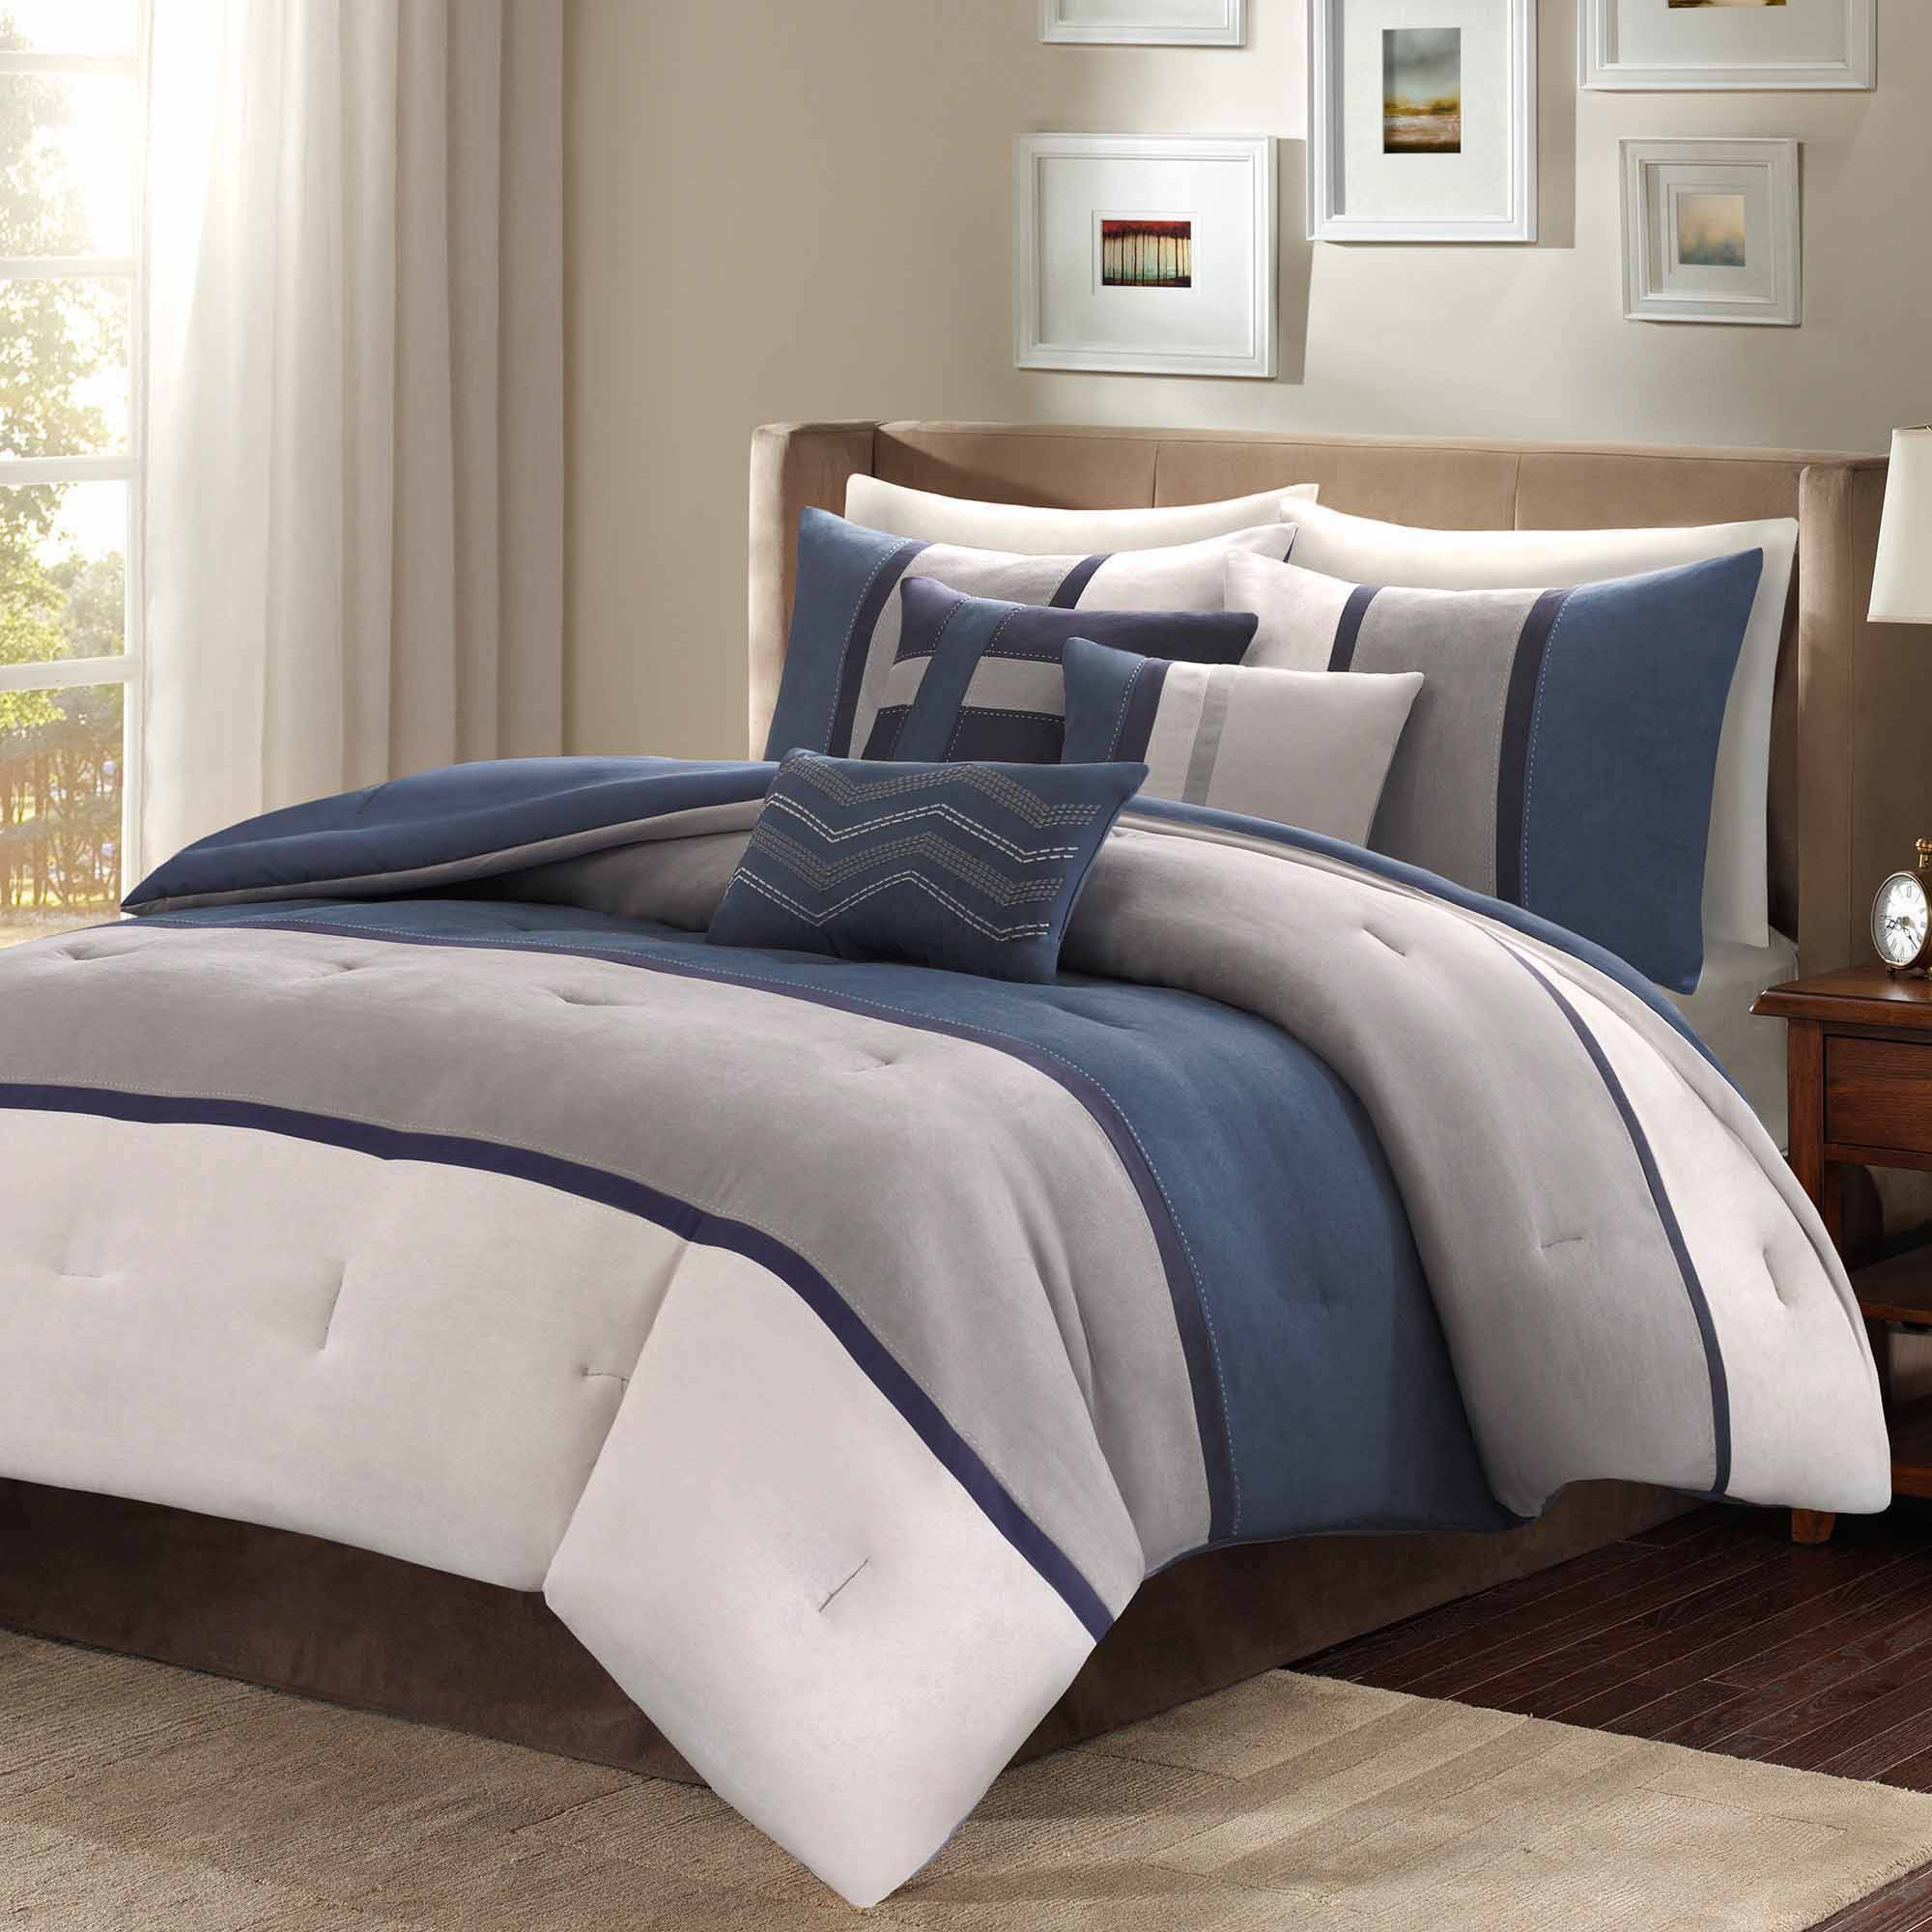 Home Essence Overland 7-Piece Comforter Set